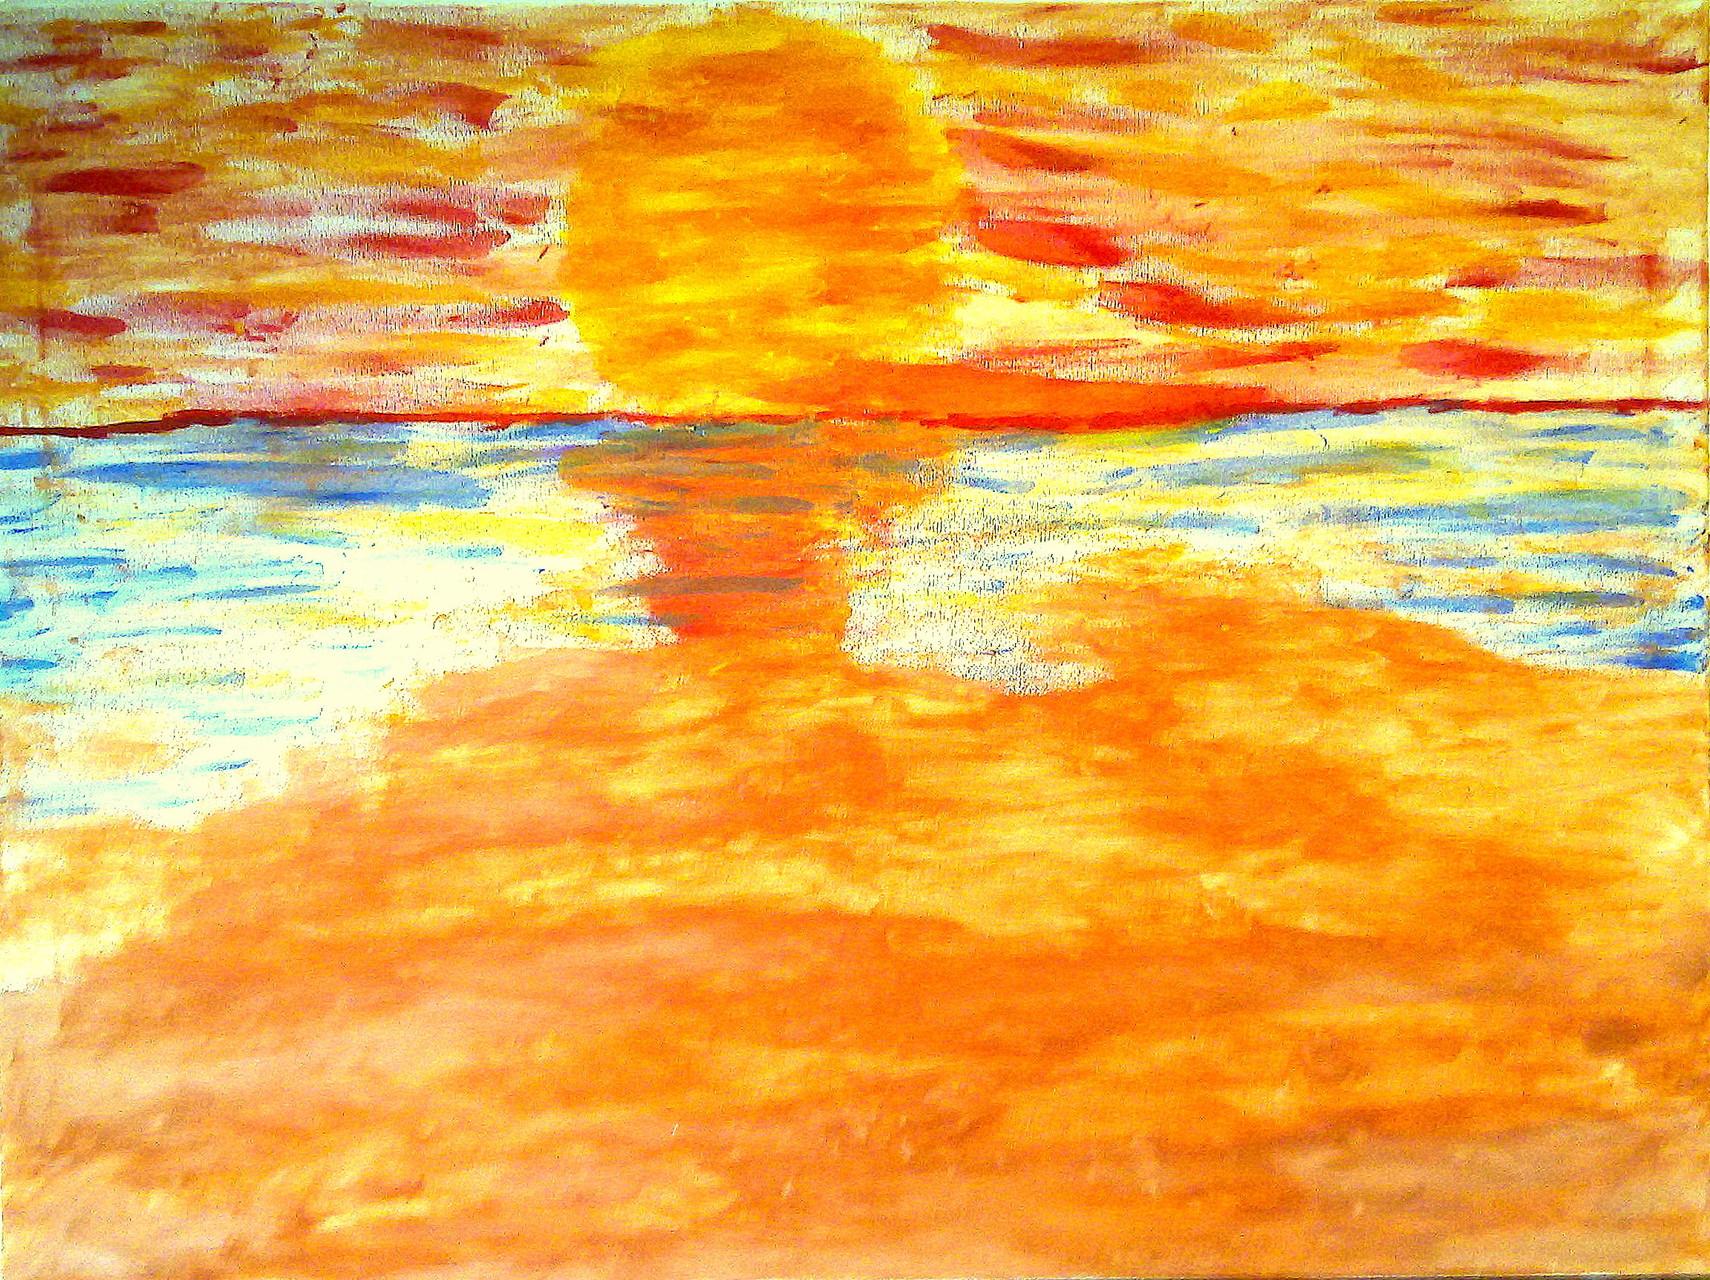 An einem Tag am Meer (80 x 60) Acryl auf Leinwand Kaufpreis 150 €uro